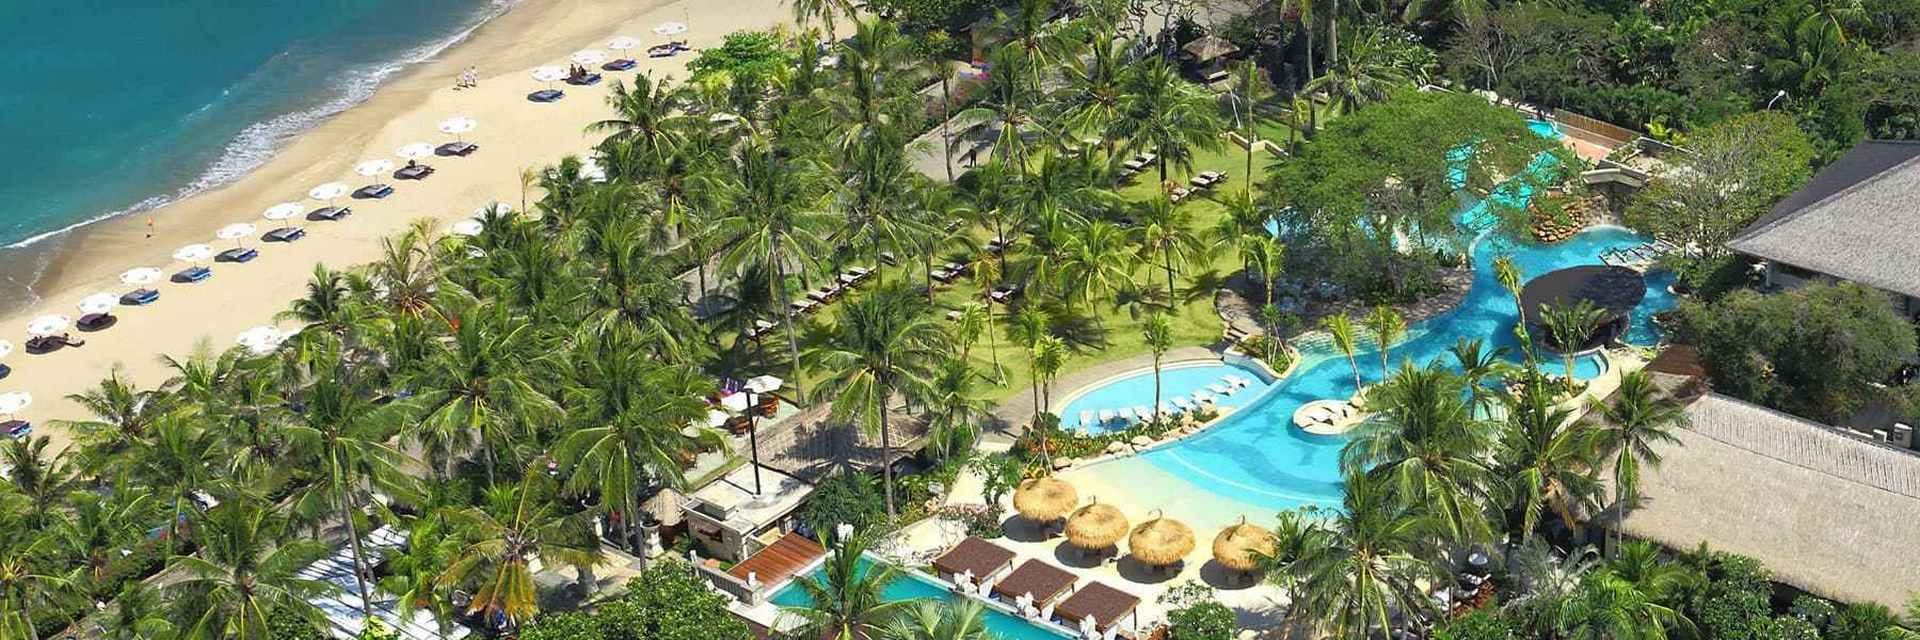 Bali Mandira Beach Resort Legian, Hotel Tepi Pantai Dengan Suasana Eksklusif Bali Mandira Beach Resort Legian Hotel Tepi Pantai Dengan Suasana Eksklusif - Dolan Dolen